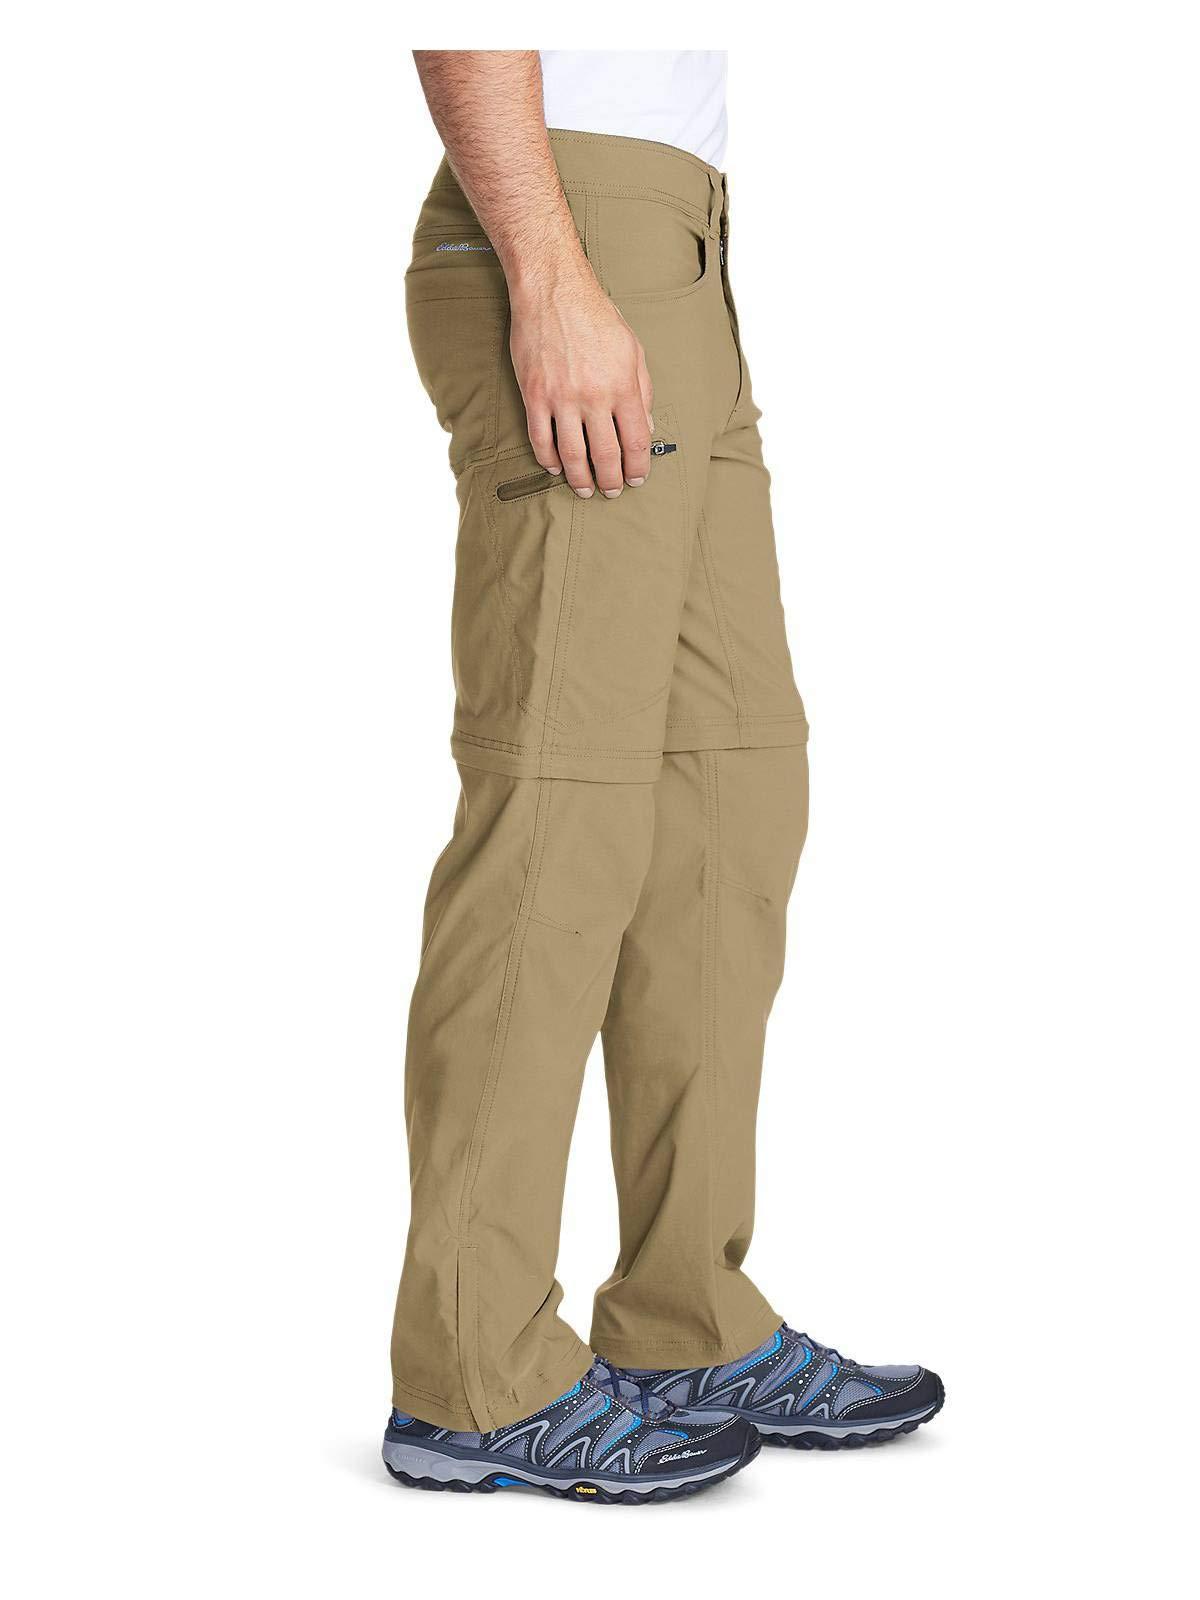 Eddie Bauer Men's Guide Pro Convertible Pants, Saddle Regular 32/30 by Eddie Bauer (Image #3)